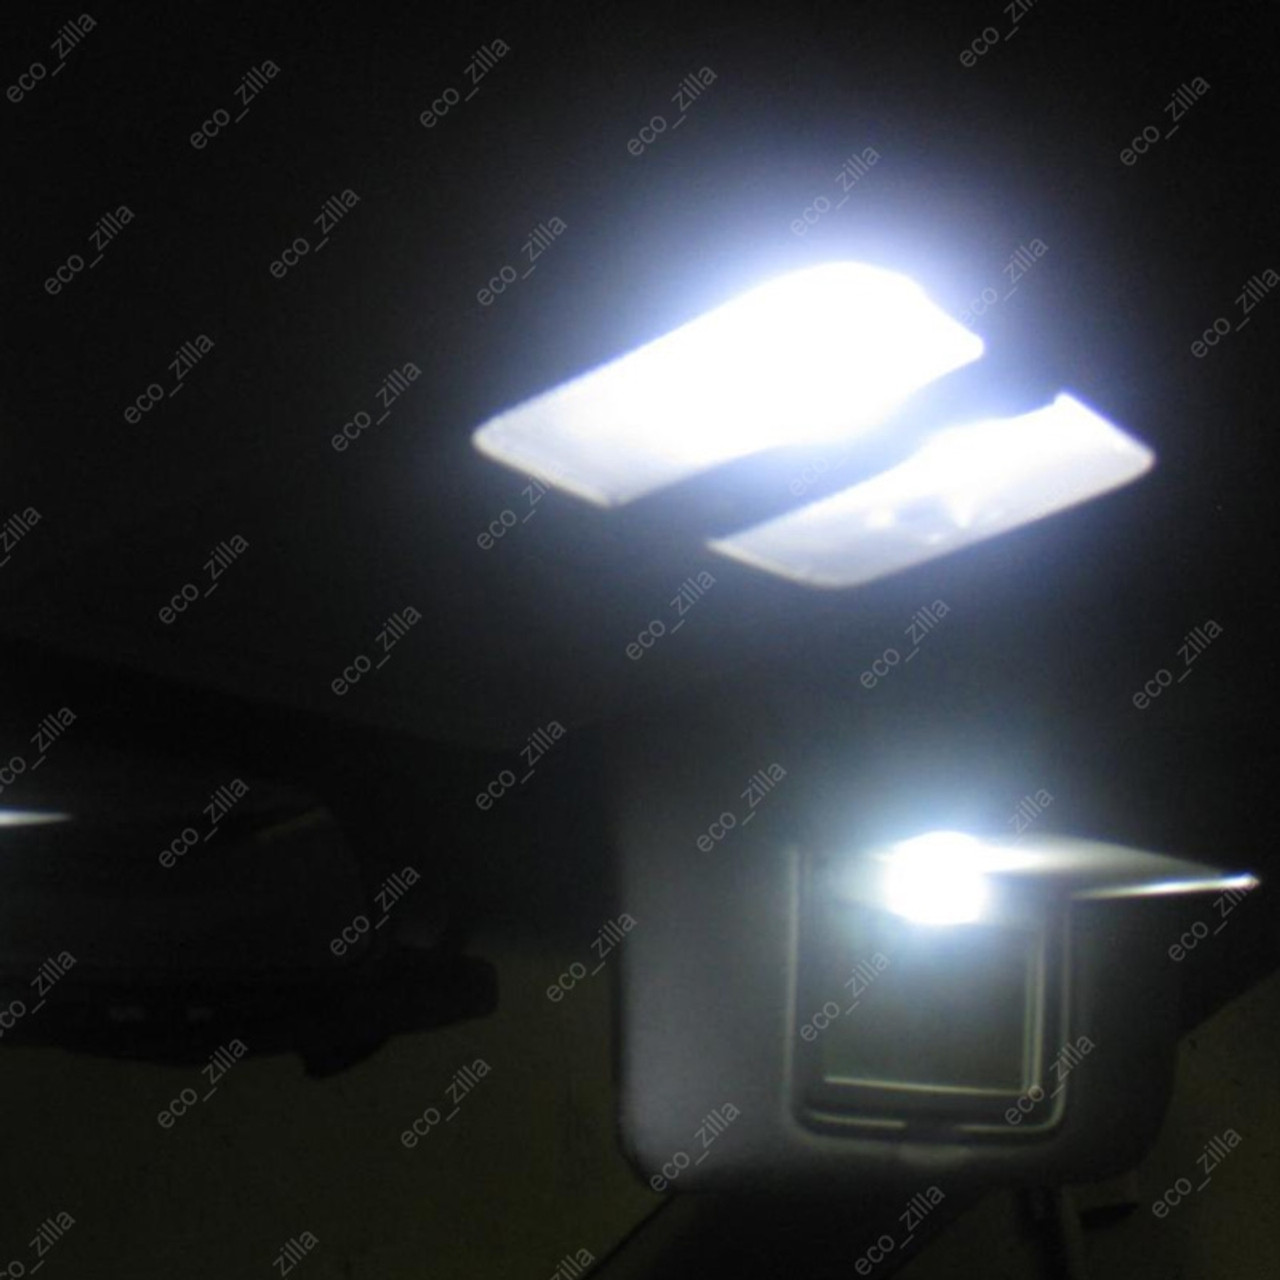 Interior Dome Light